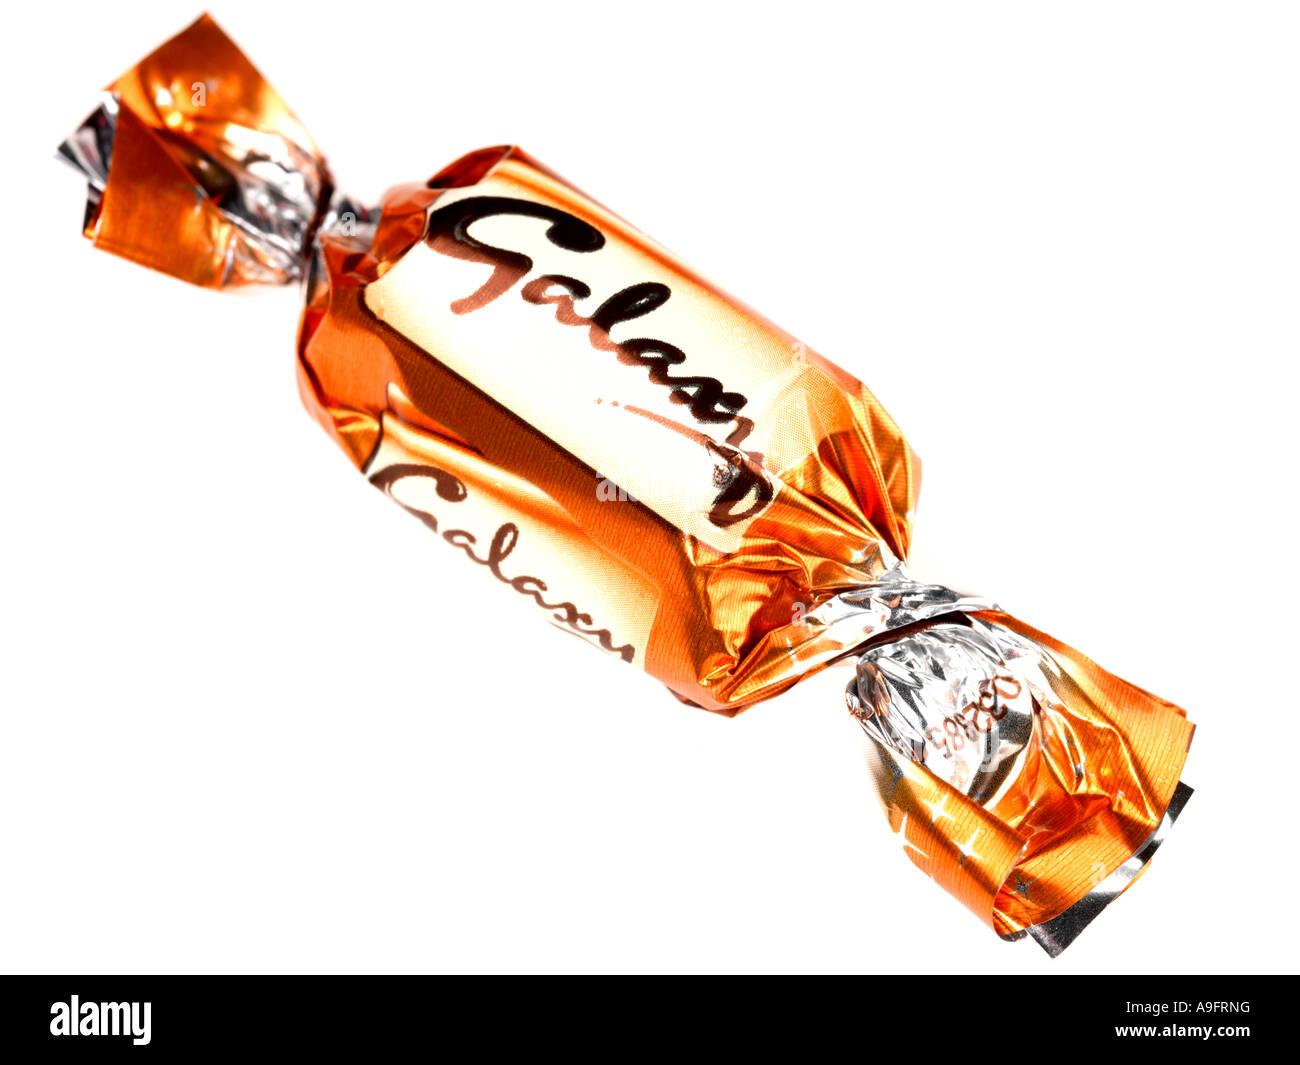 Galaxy Chocolate Bars Stock Photos & Galaxy Chocolate Bars Stock ...